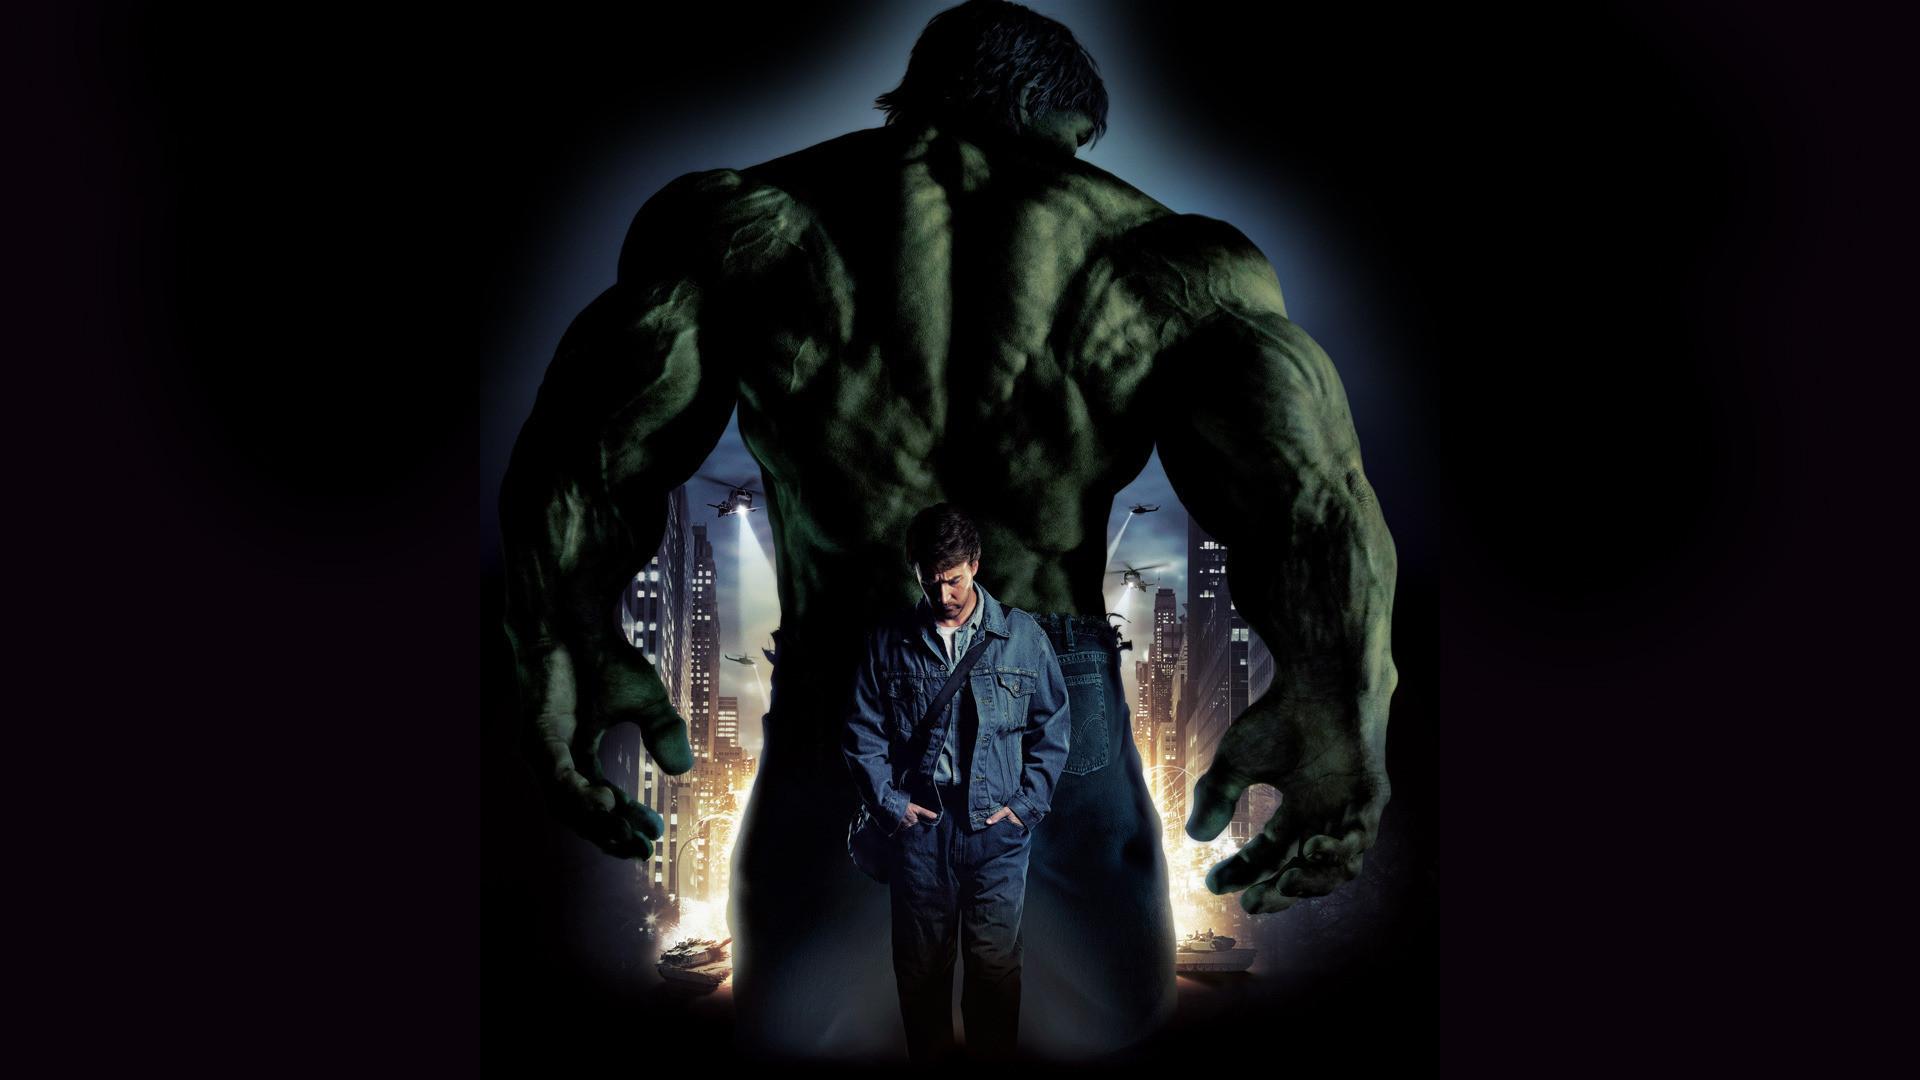 hulk-hd-wallpaper.jpg (1920×1200) | Gabbo's Shit | Pinterest | Hulk and  Comic